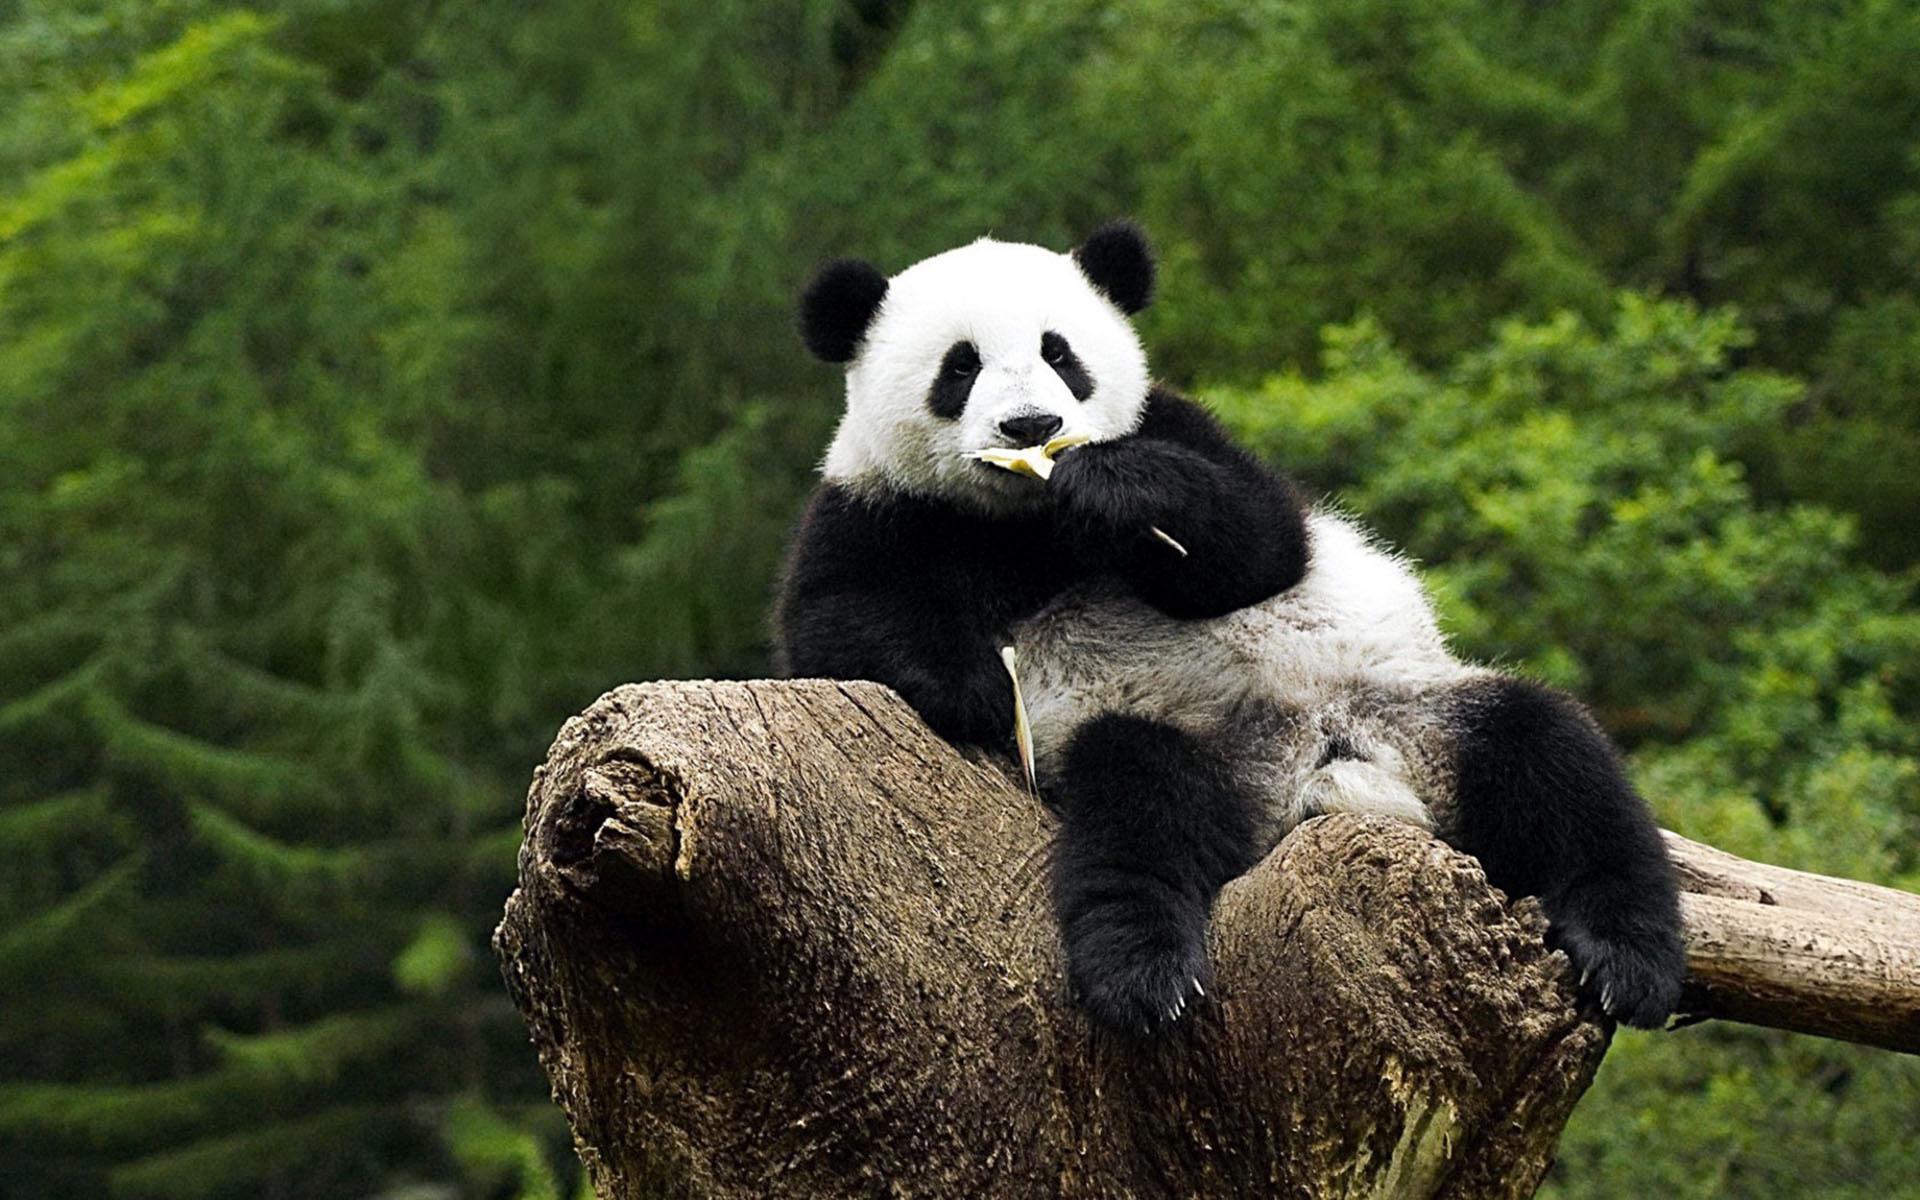 Panda Wallpapers Top Free Panda Backgrounds Wallpaperaccess